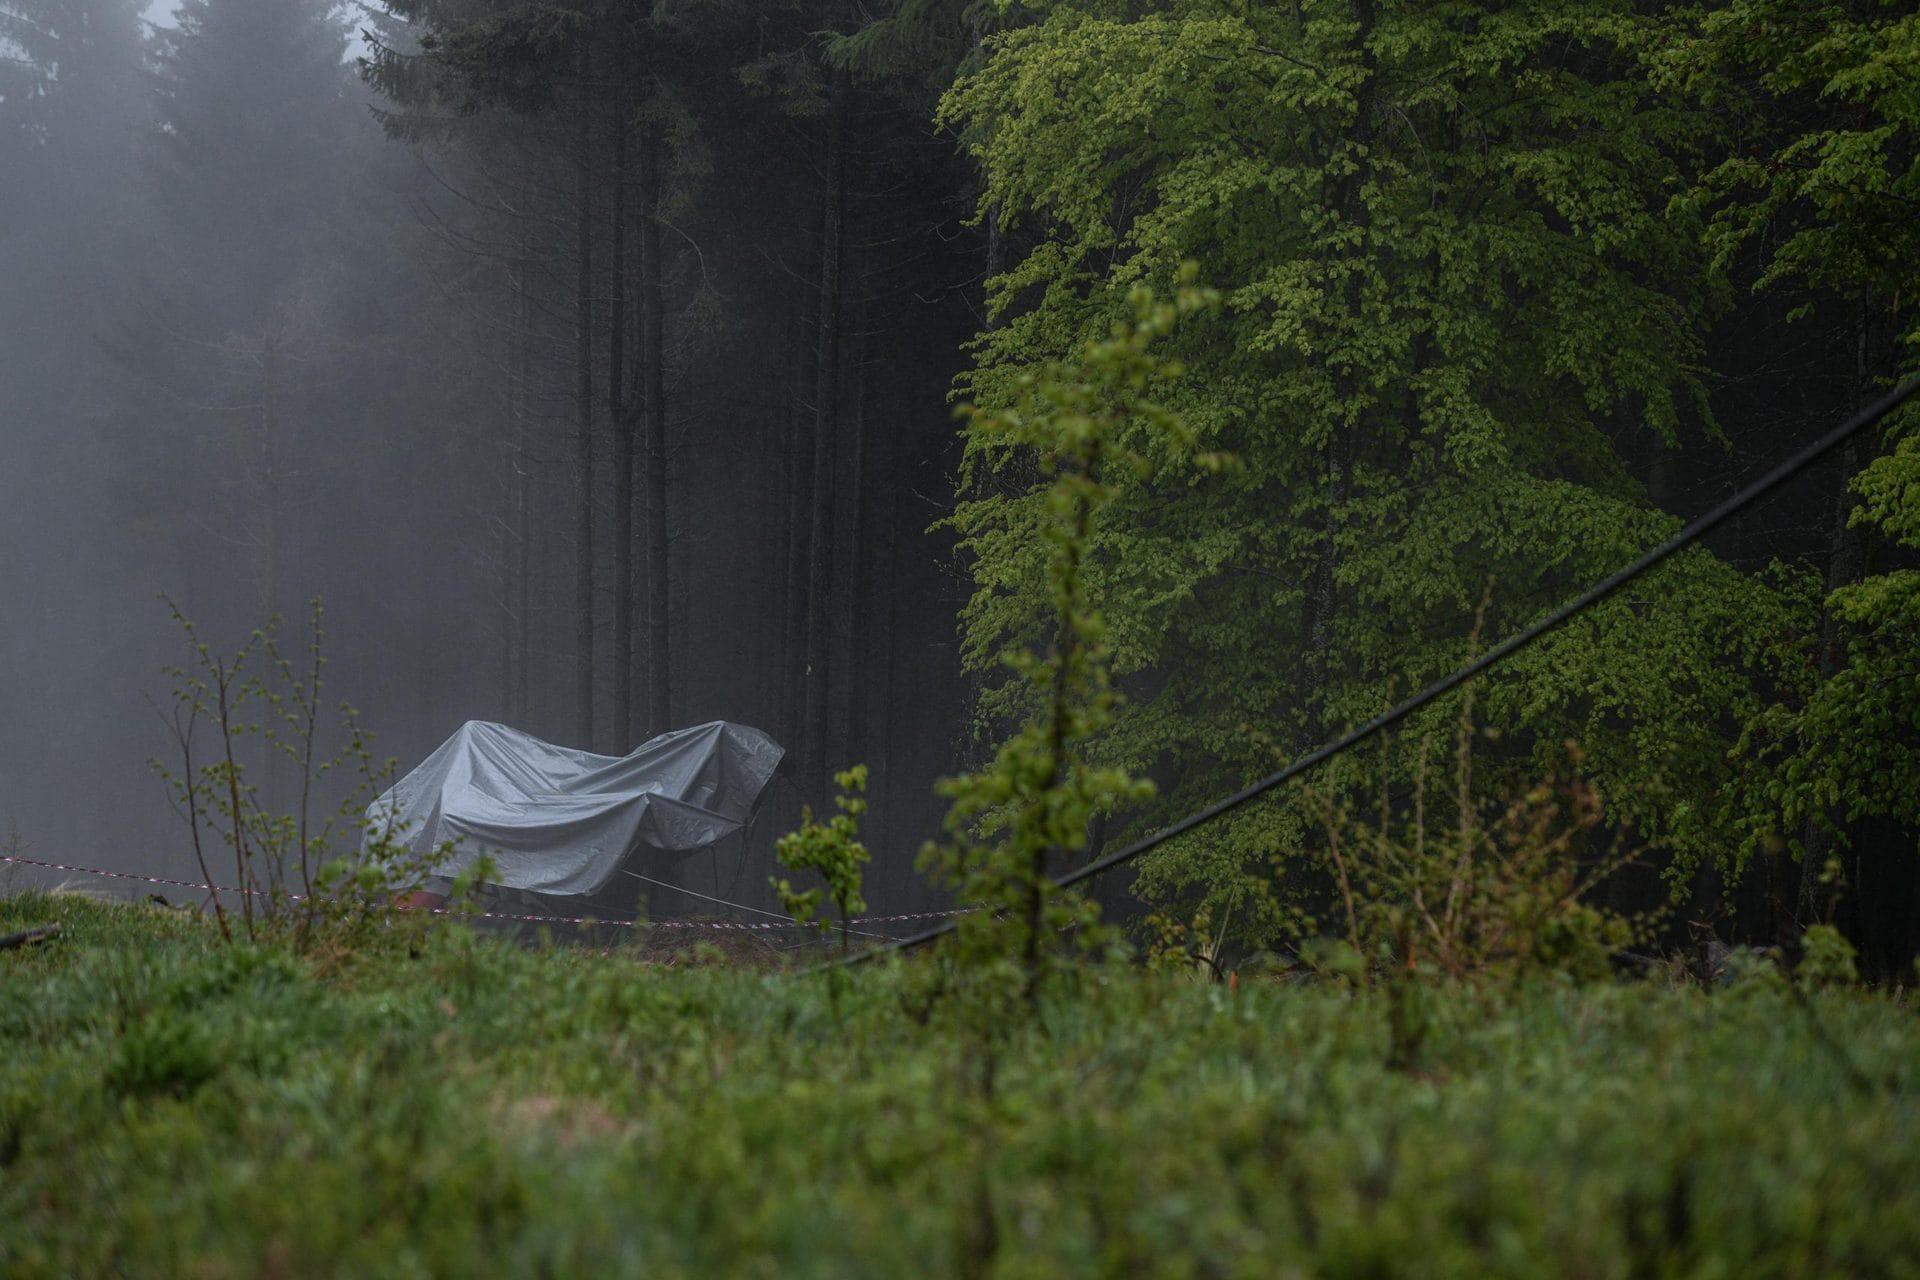 Drei Festnahmen nach Seilbahnunglück in Italien Unfälle